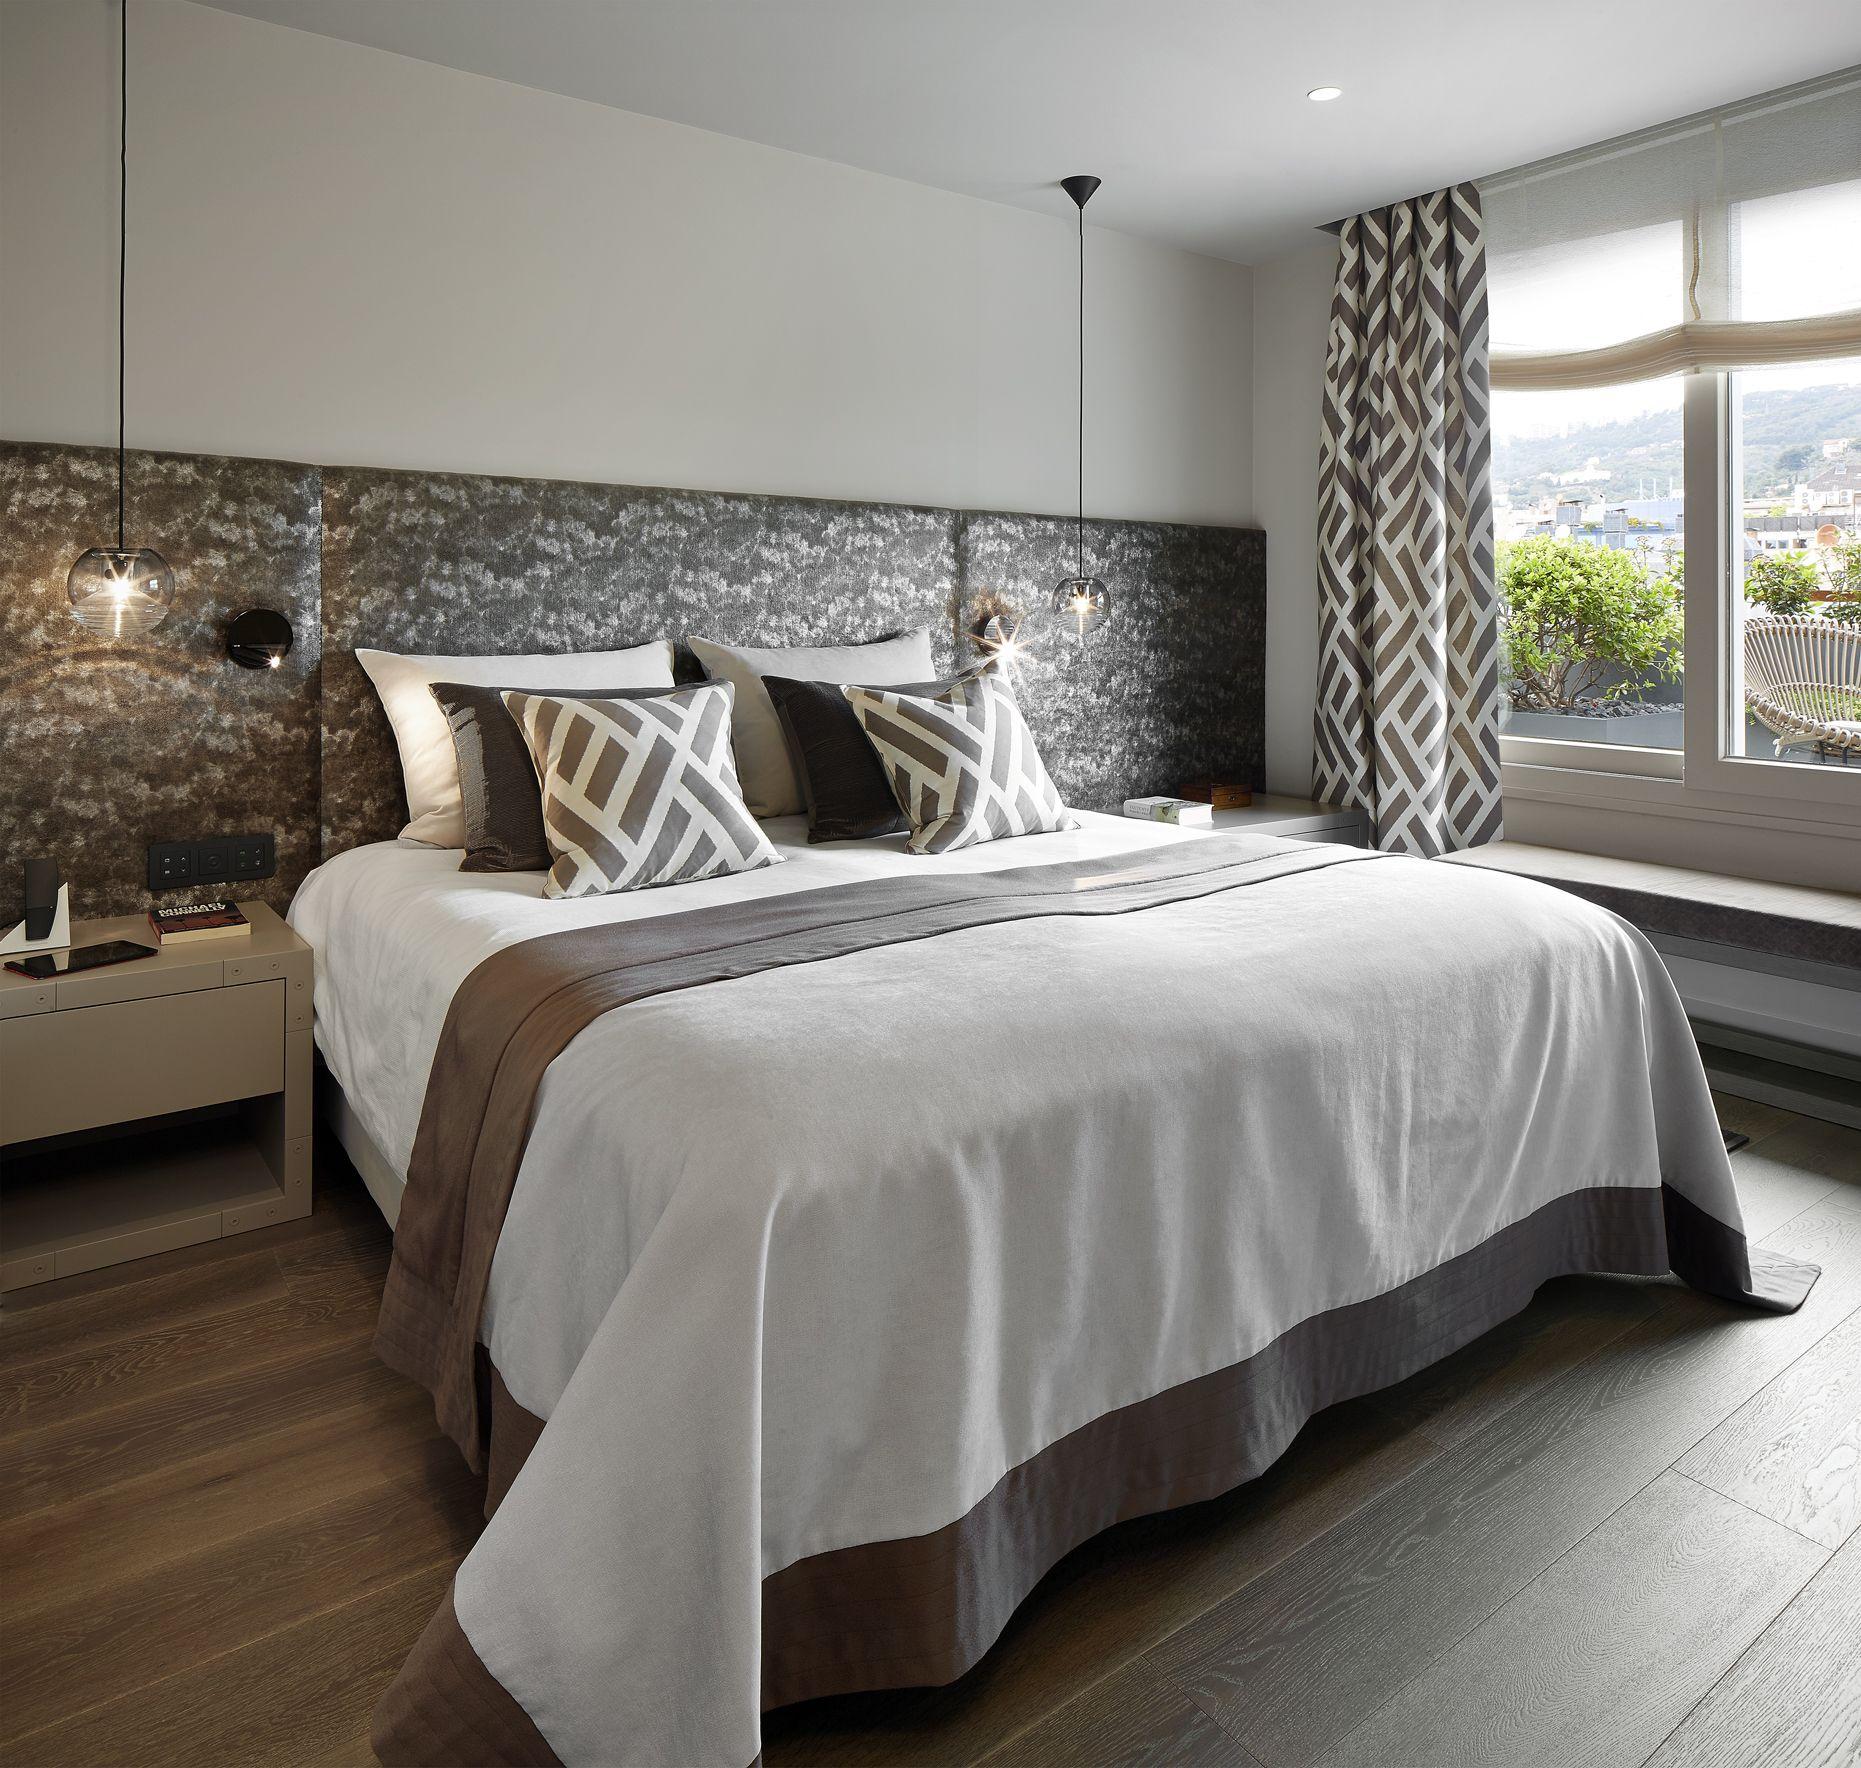 Molins interiors arquitectura interior interiorismo decoraci n dormitorio suite - Decoracion cortinas dormitorio ...